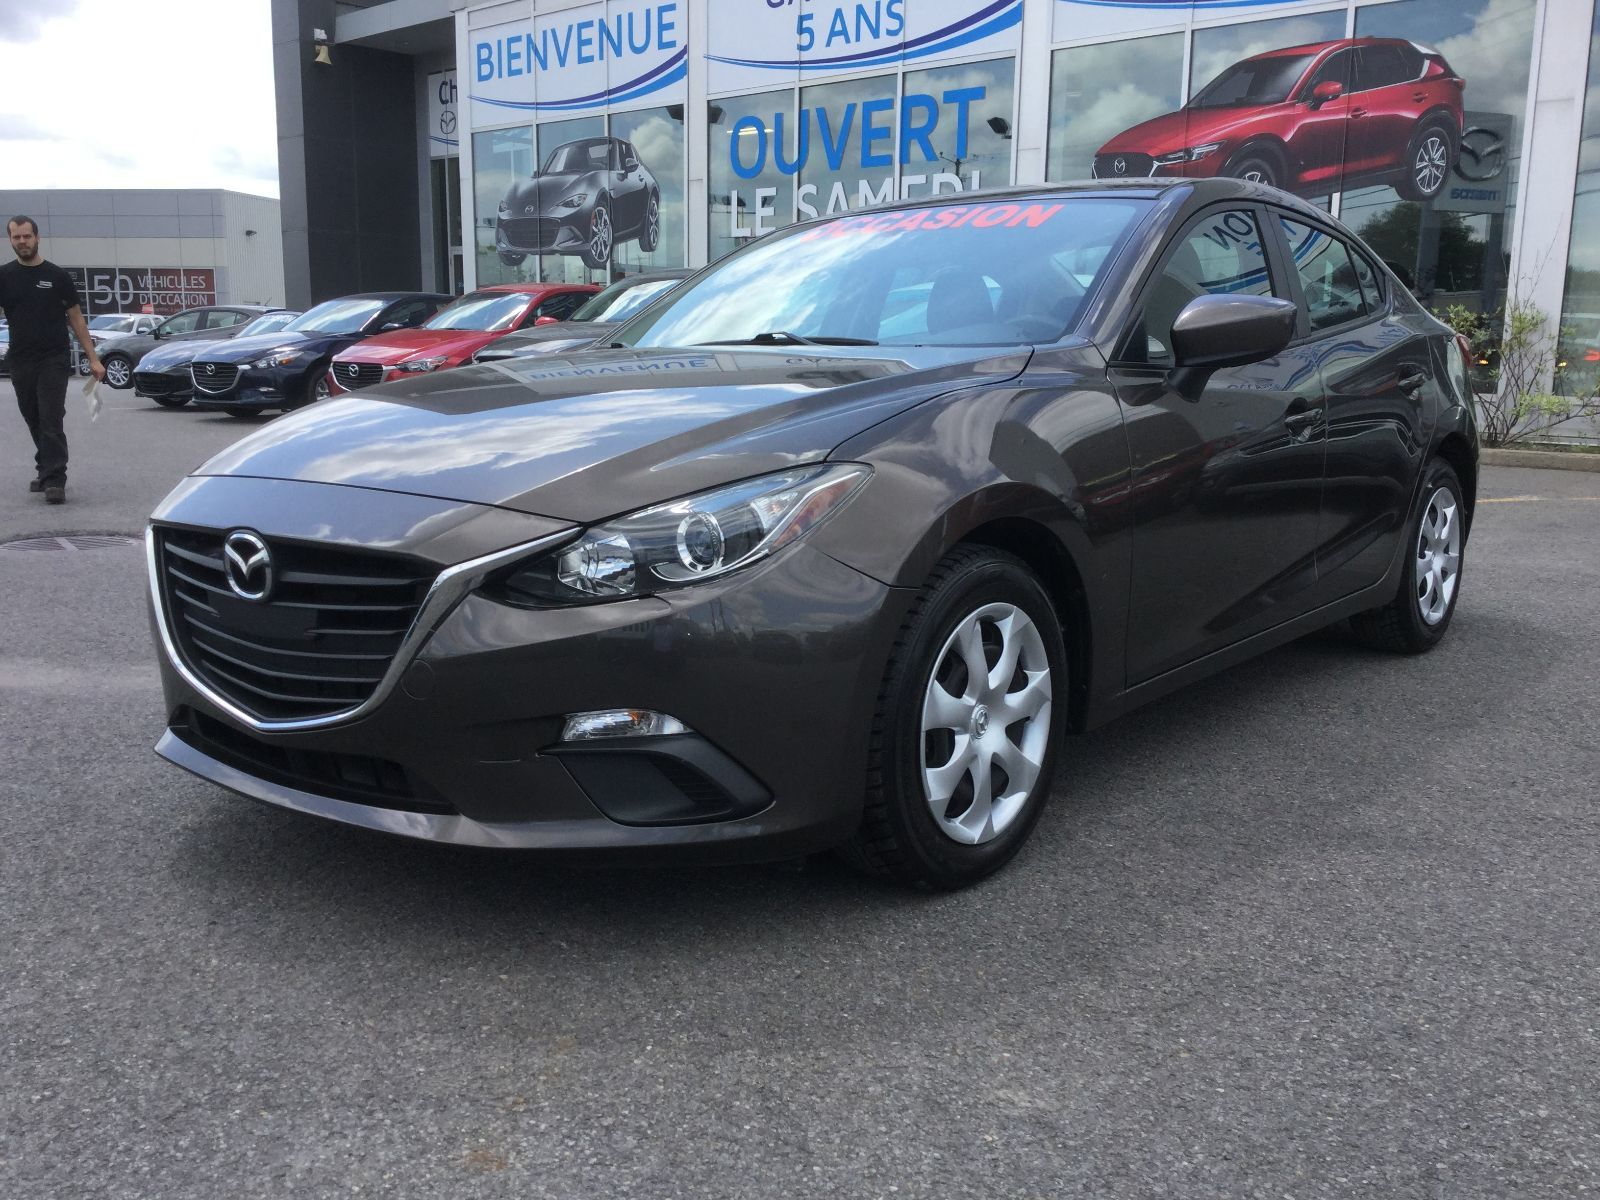 Mazda Mazda3 GX, BLUETOOTH, A/C, GROUPE ELECTRIQUE 2015 JAMAIS ACCIDENTÉ, UN SEUL PROPRIÉTAIRE